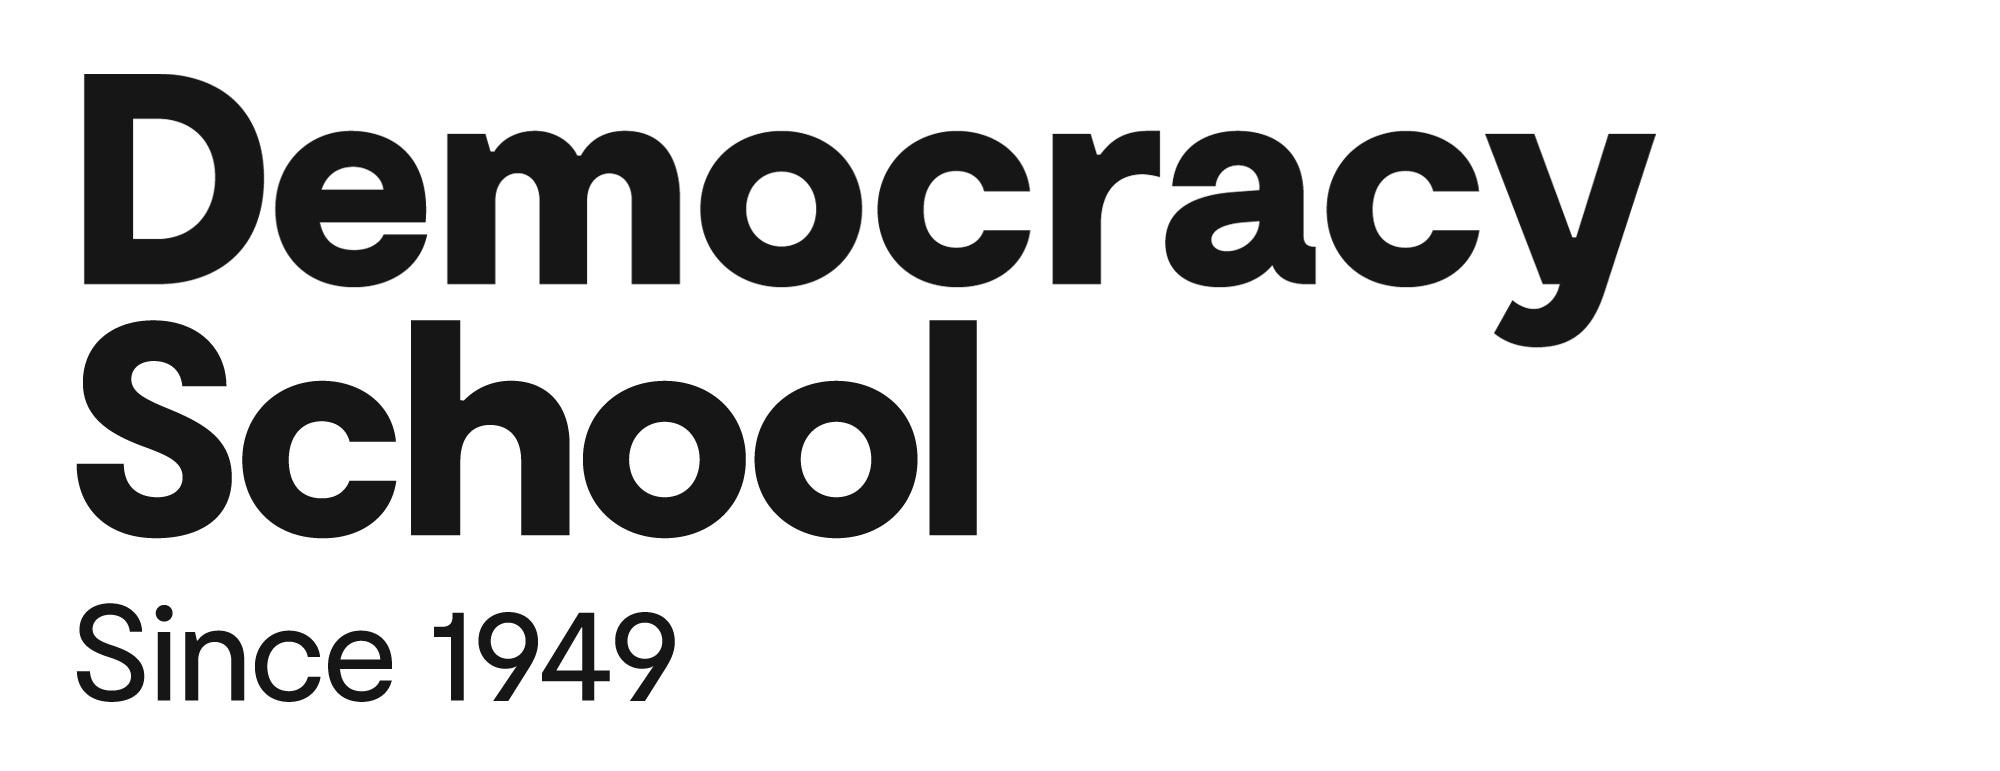 distinc_portfolio_westland_school_logo6.jpg